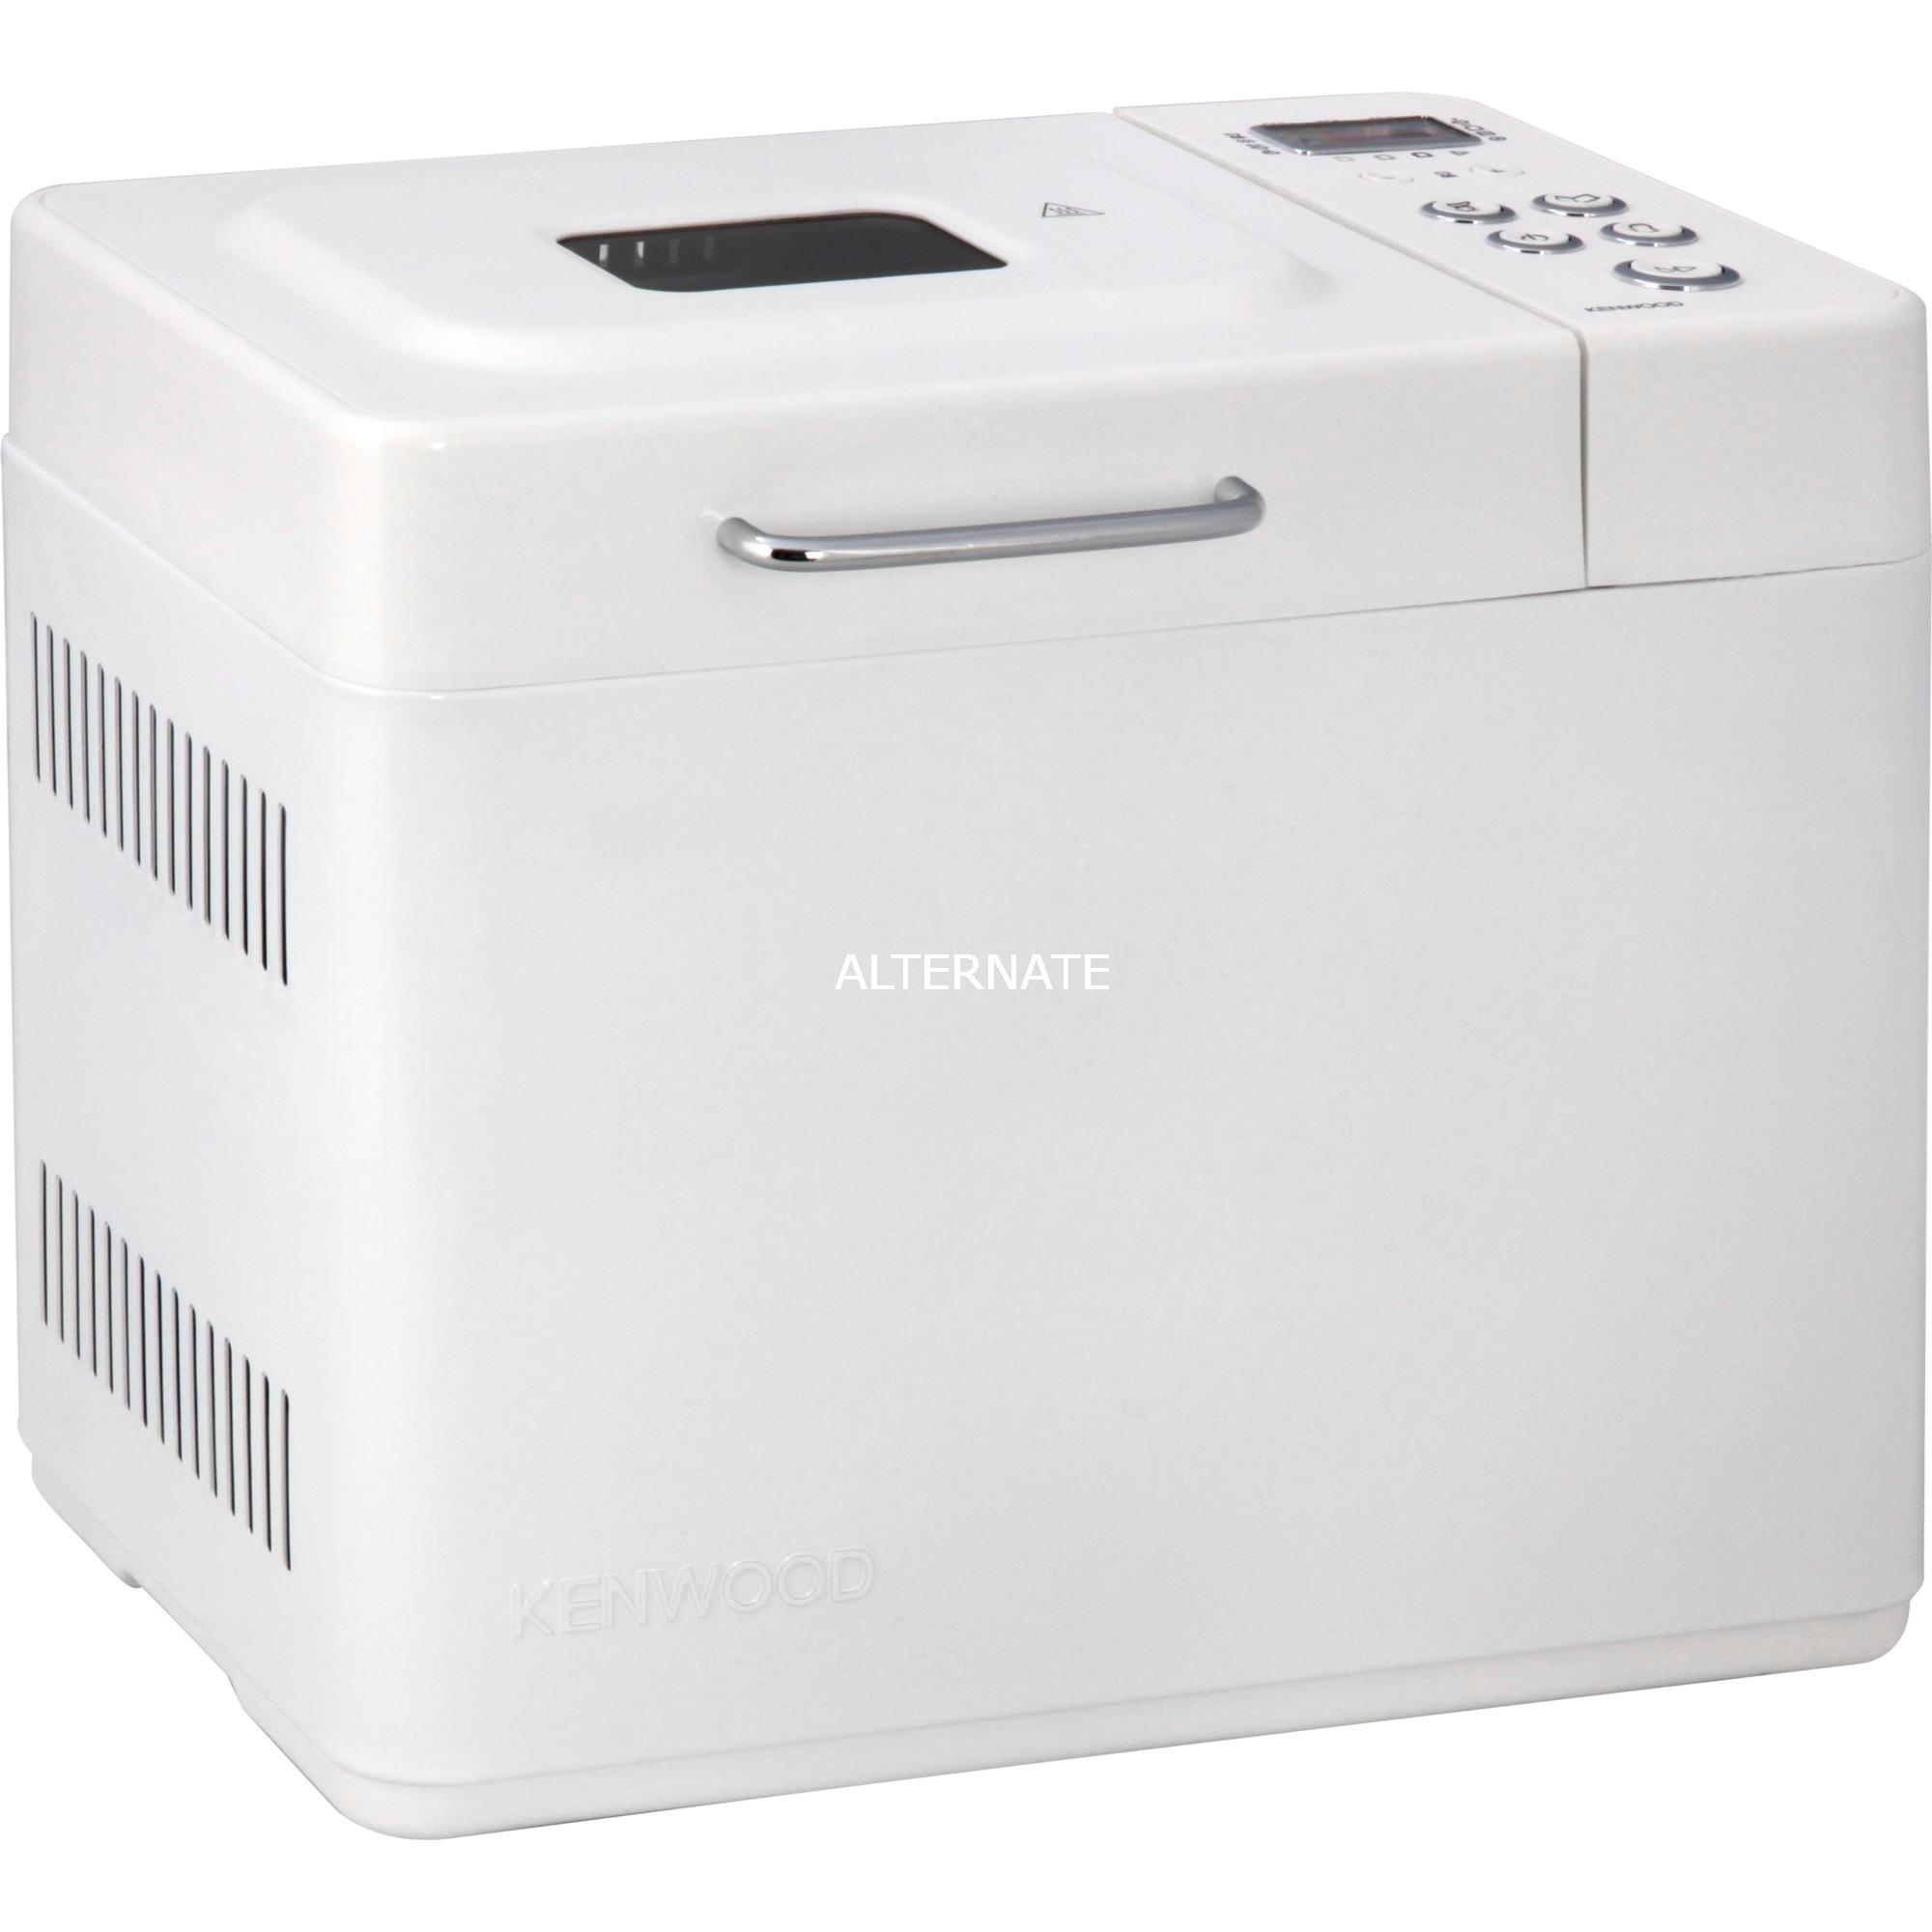 BM250 Bread Maker 480W Blanco panificadora